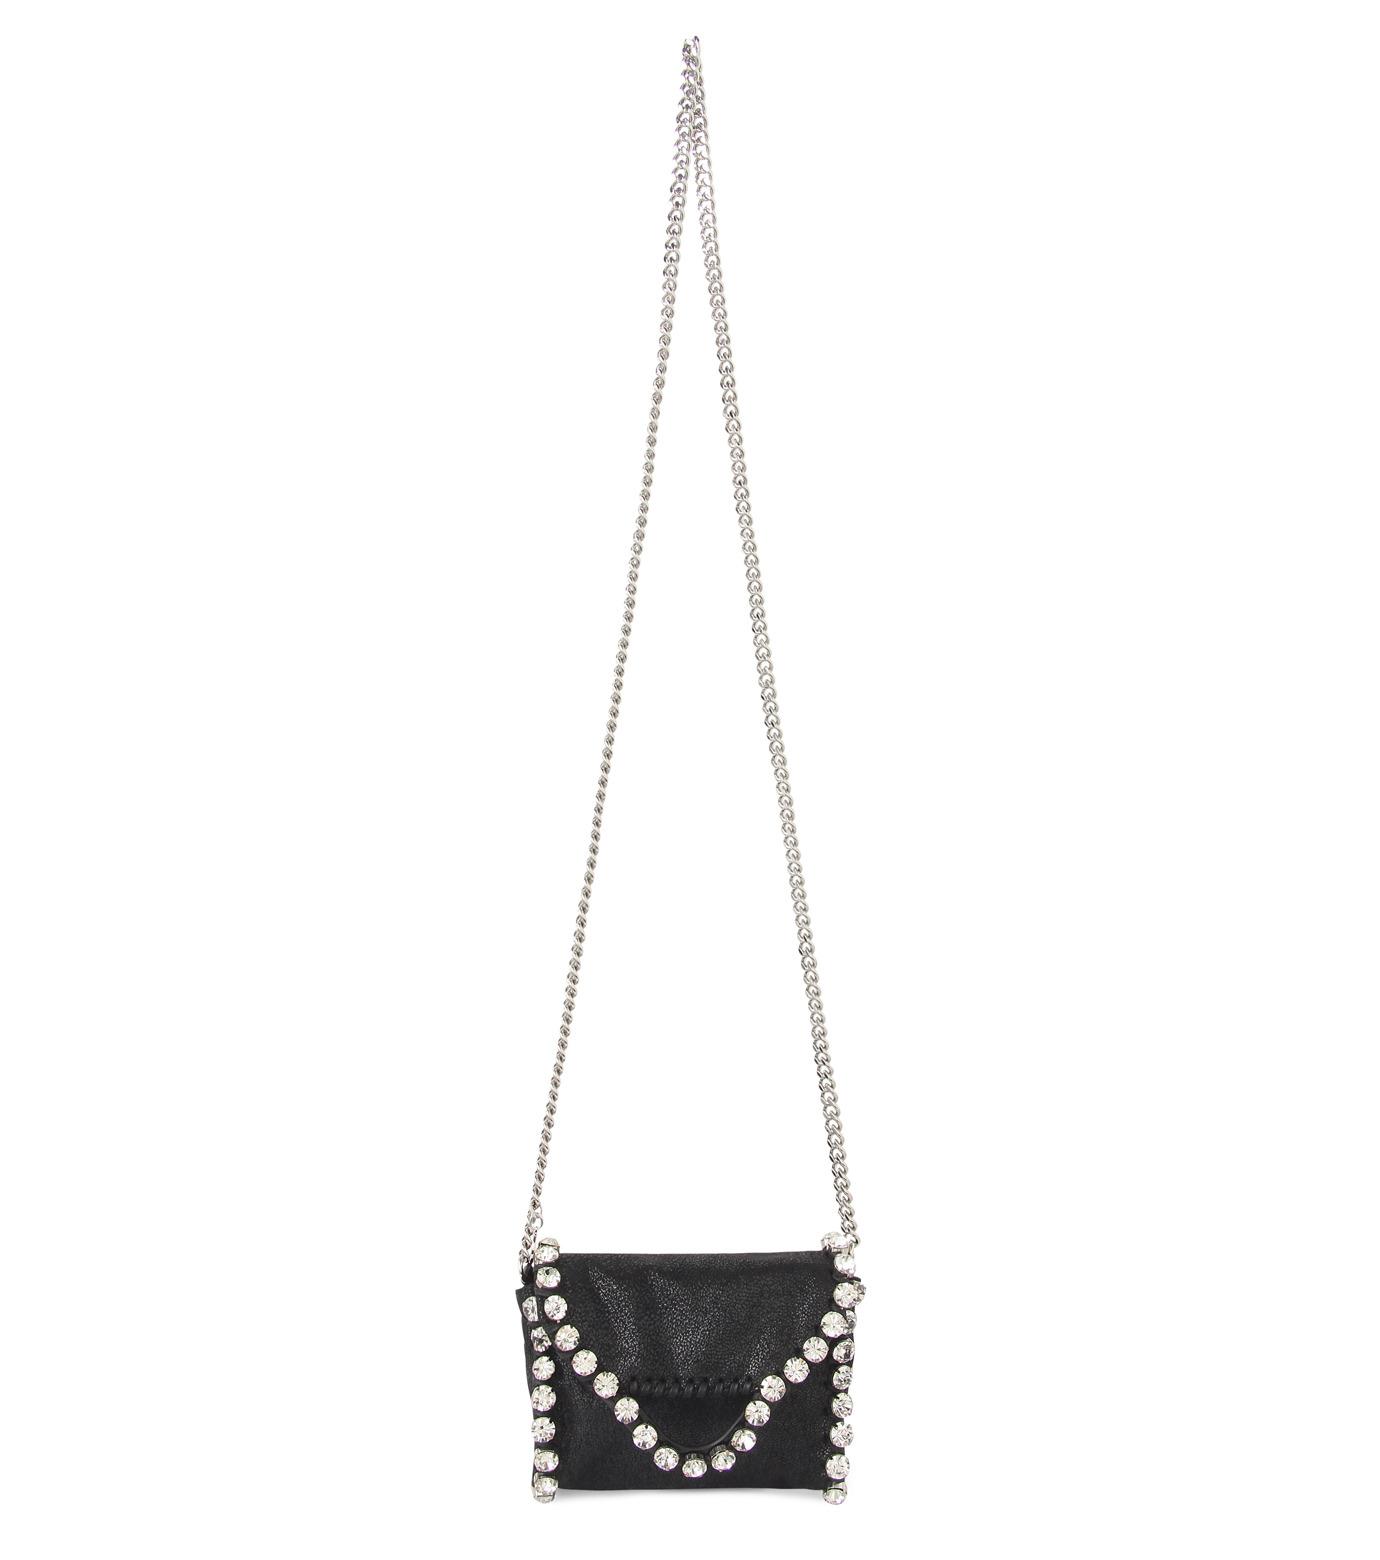 Stella McCartney(ステラマッカートニー)のTiny Fold Over Cross-Body-BLACK(バッグ/ショルダーバッグ/bag/shoulder bag)-391697-W9746-13 拡大詳細画像1